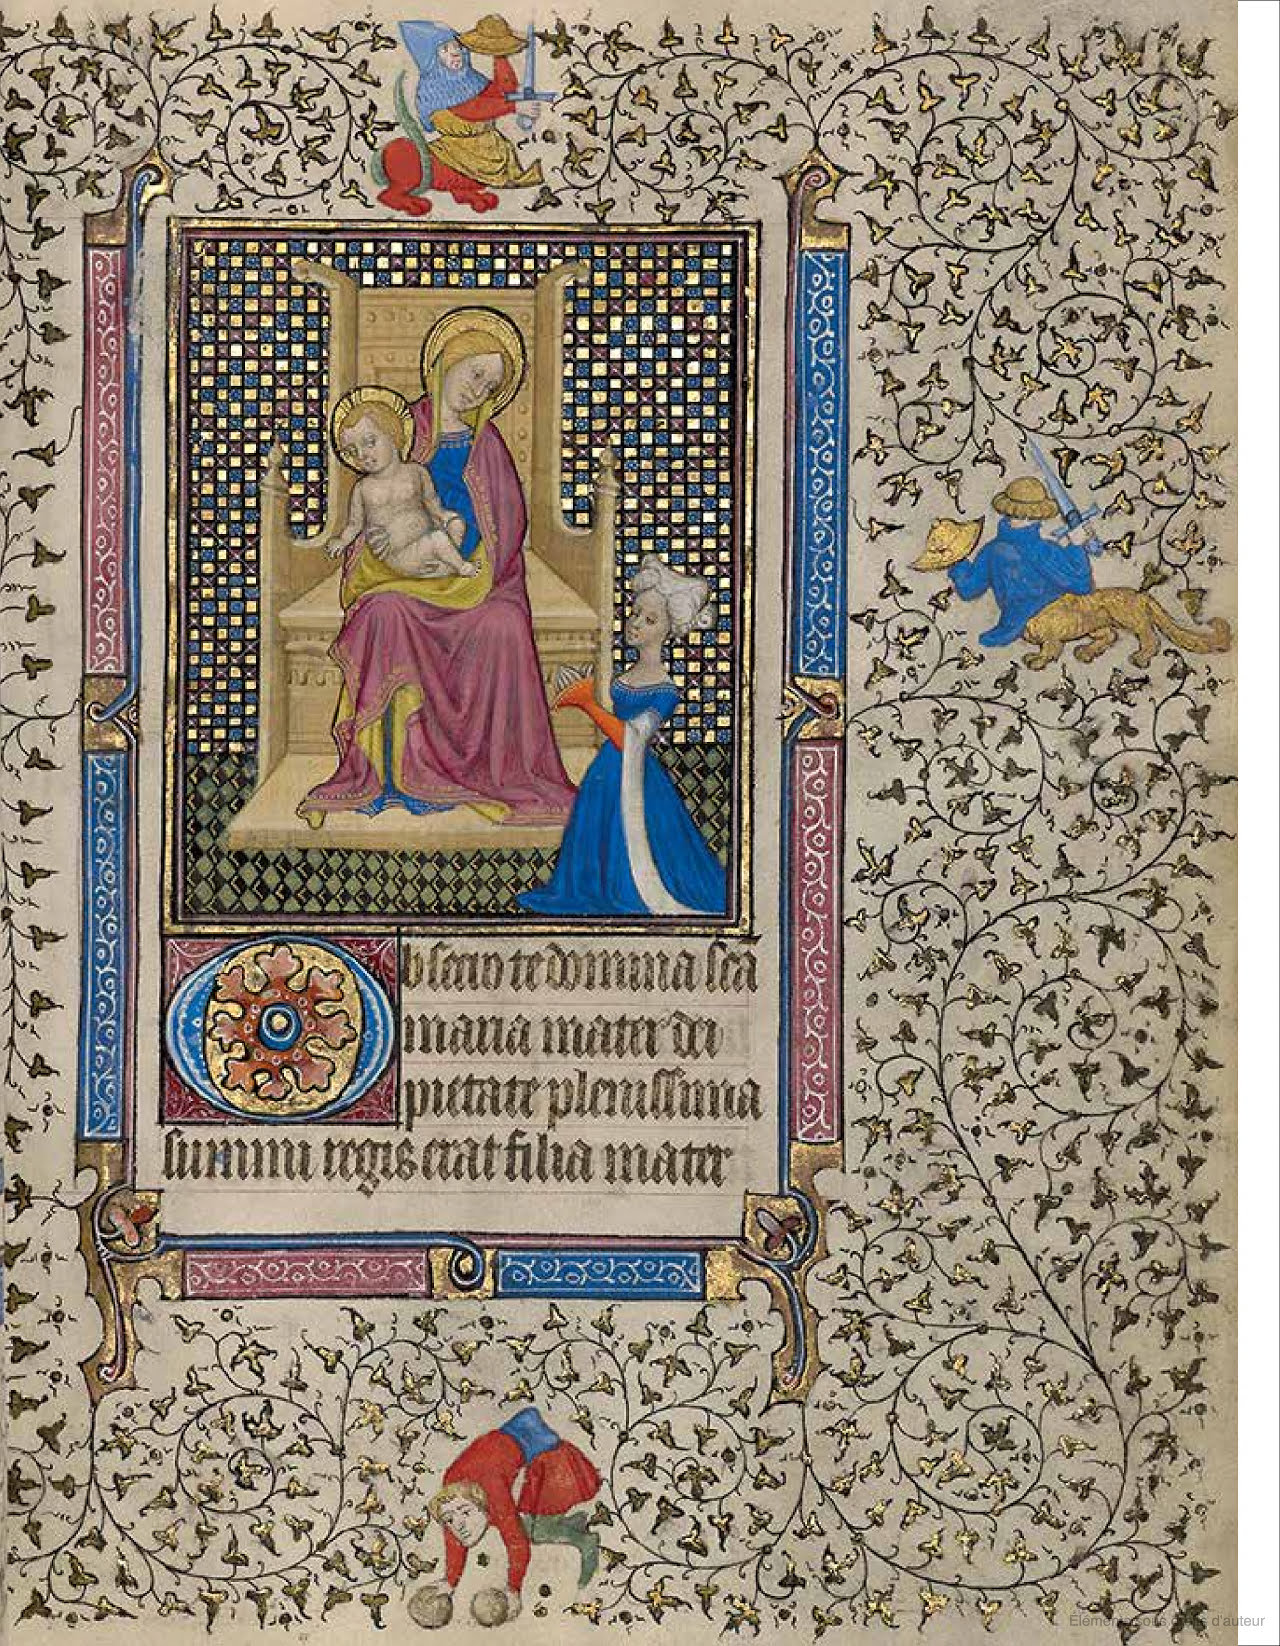 1410 ca Follower of the Egerton Master Paris Getty Museum Ms. Ludwig IX 5, fol. 19